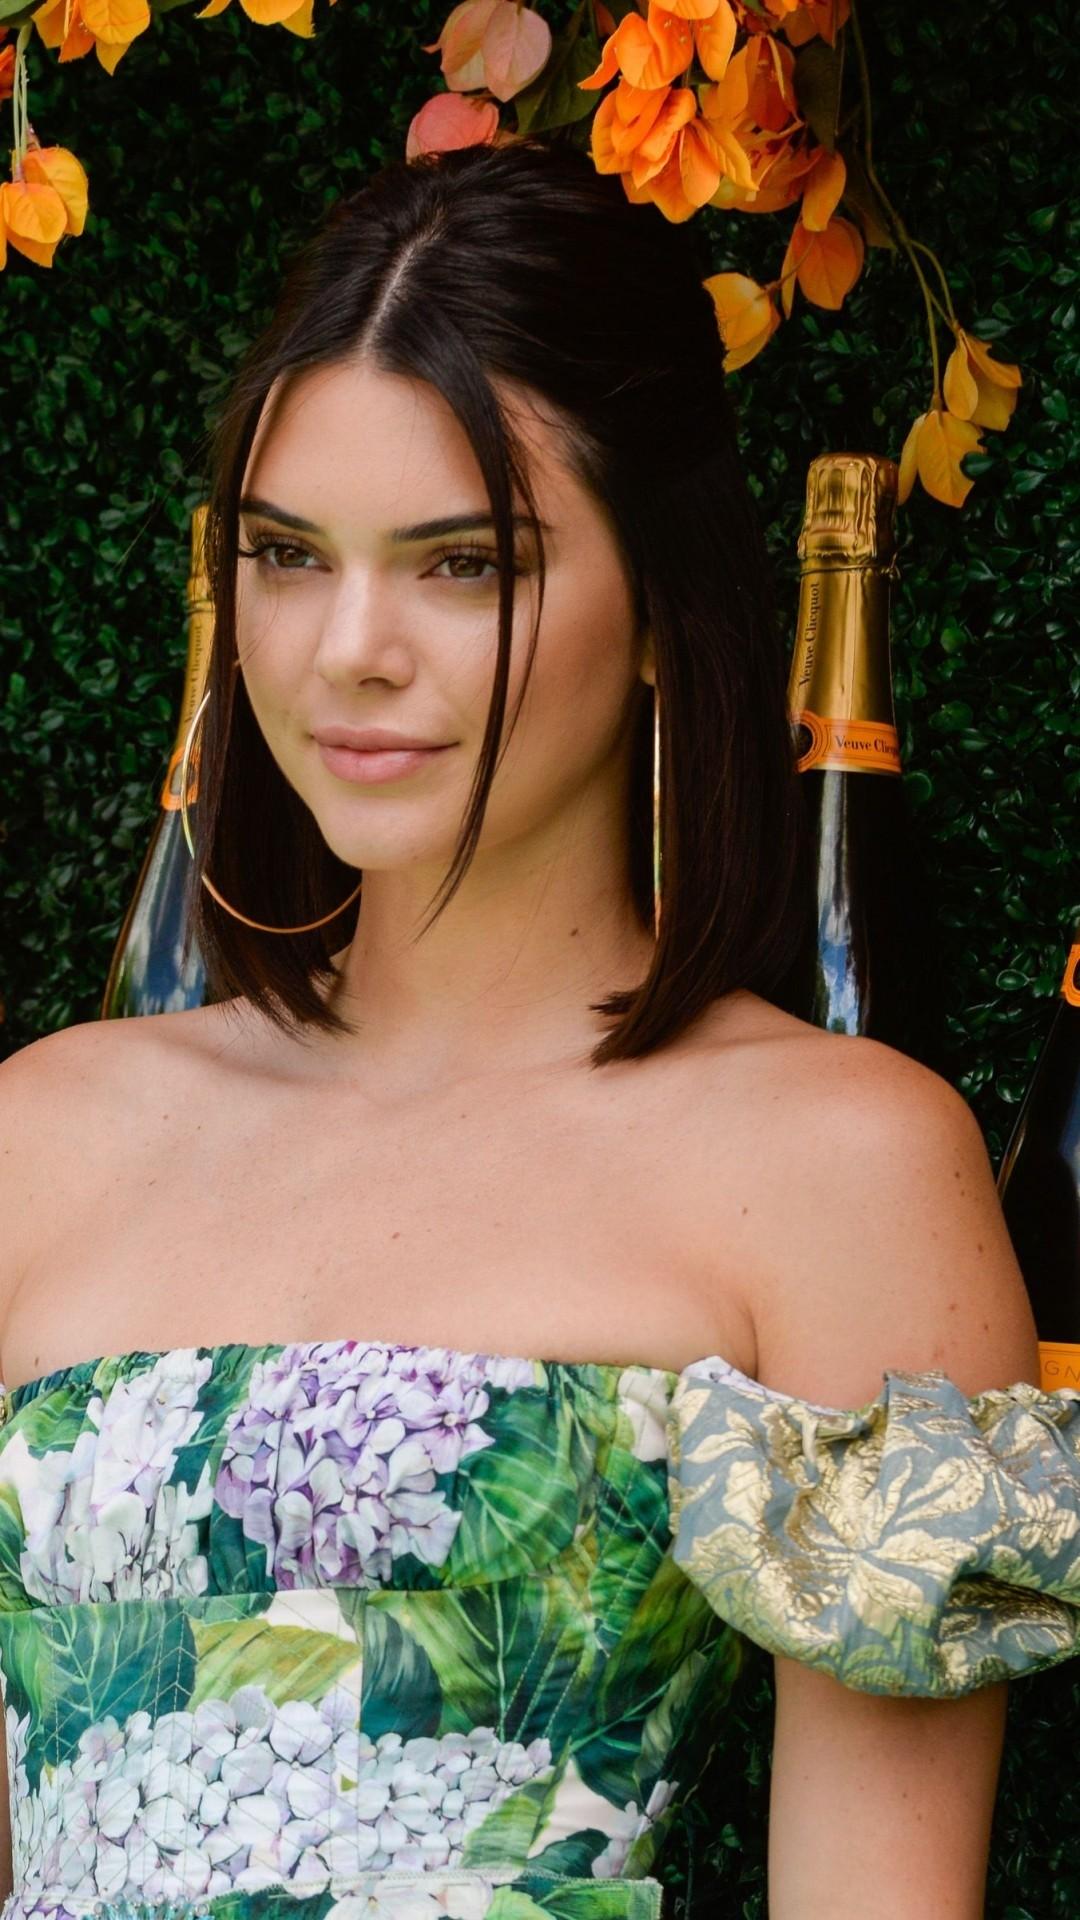 Kendall Jenner iphone 6s plus wallpaper